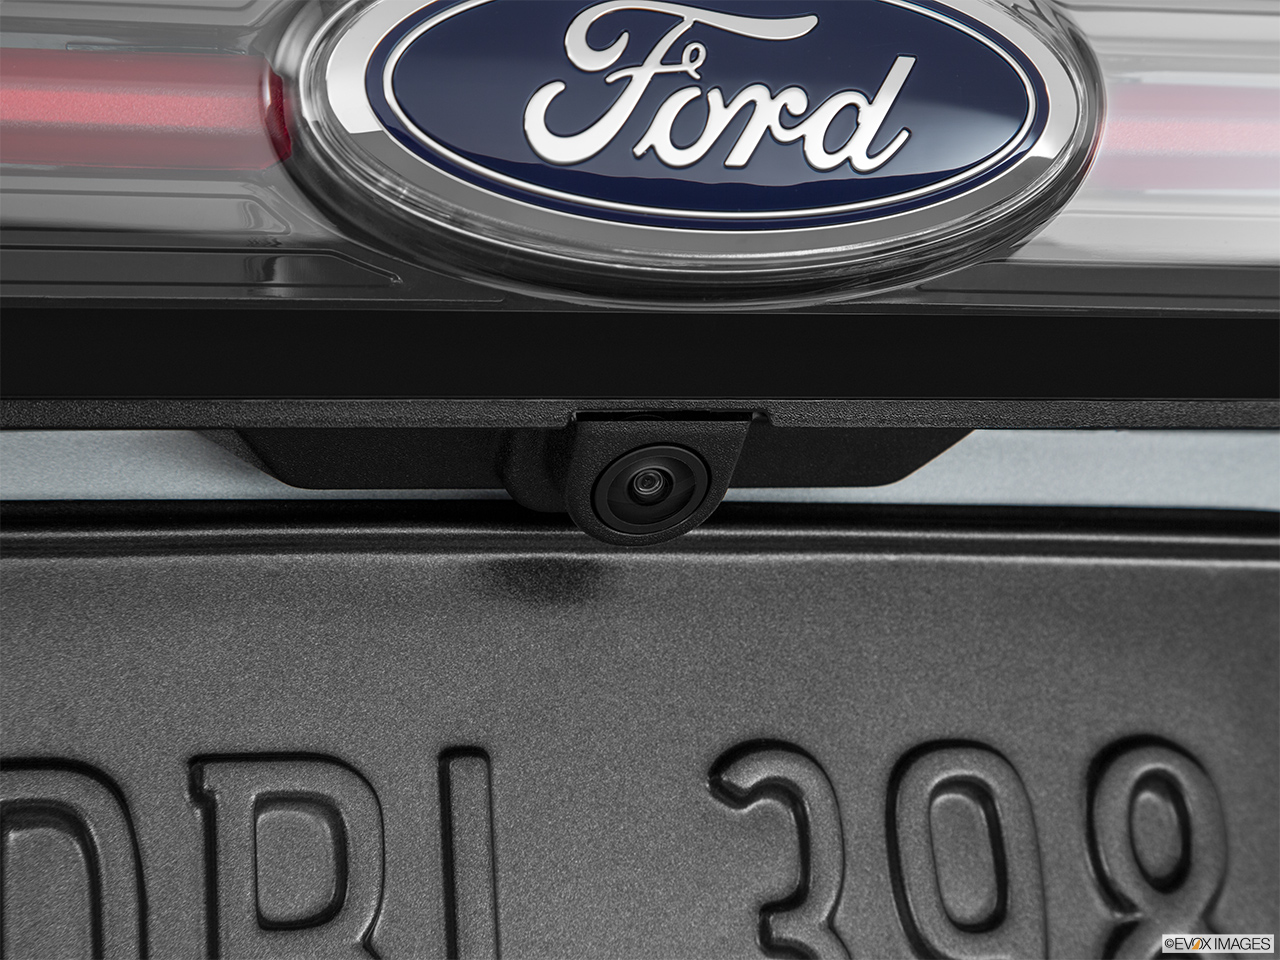 Ford Edge L Sport Kuwait Rear Back Up Camera